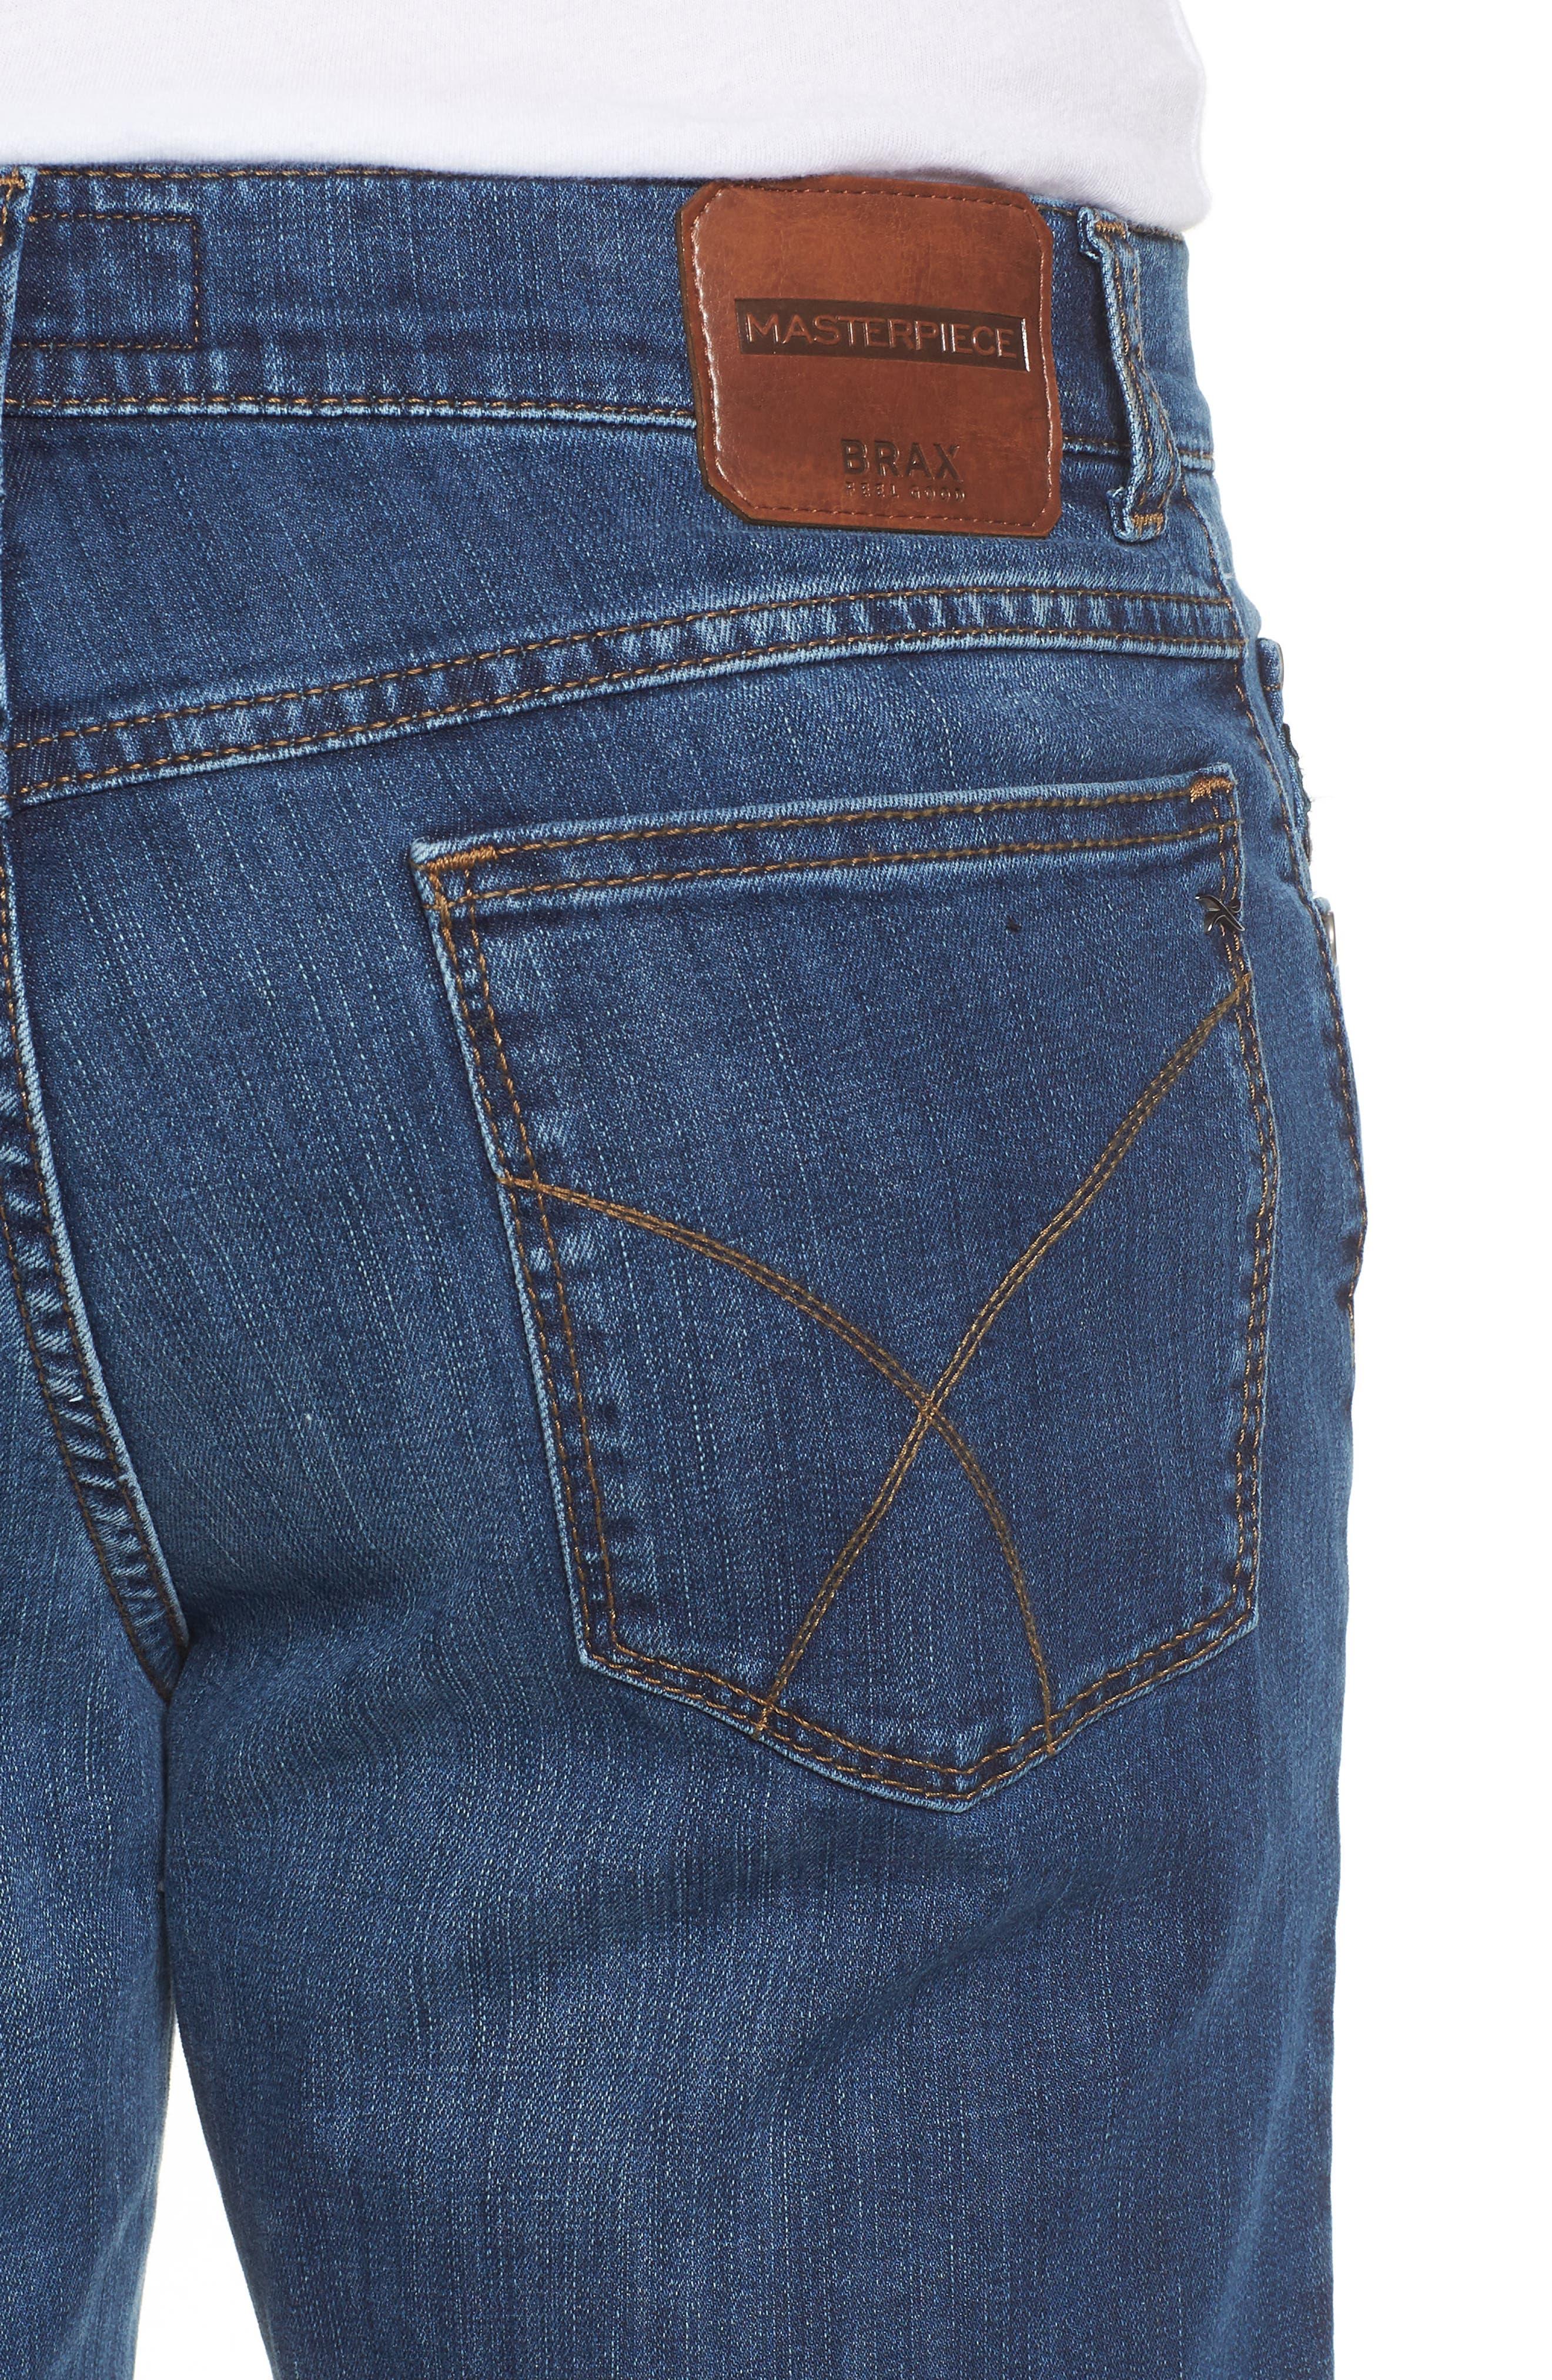 Masterpiece Regular Jeans,                             Alternate thumbnail 12, color,